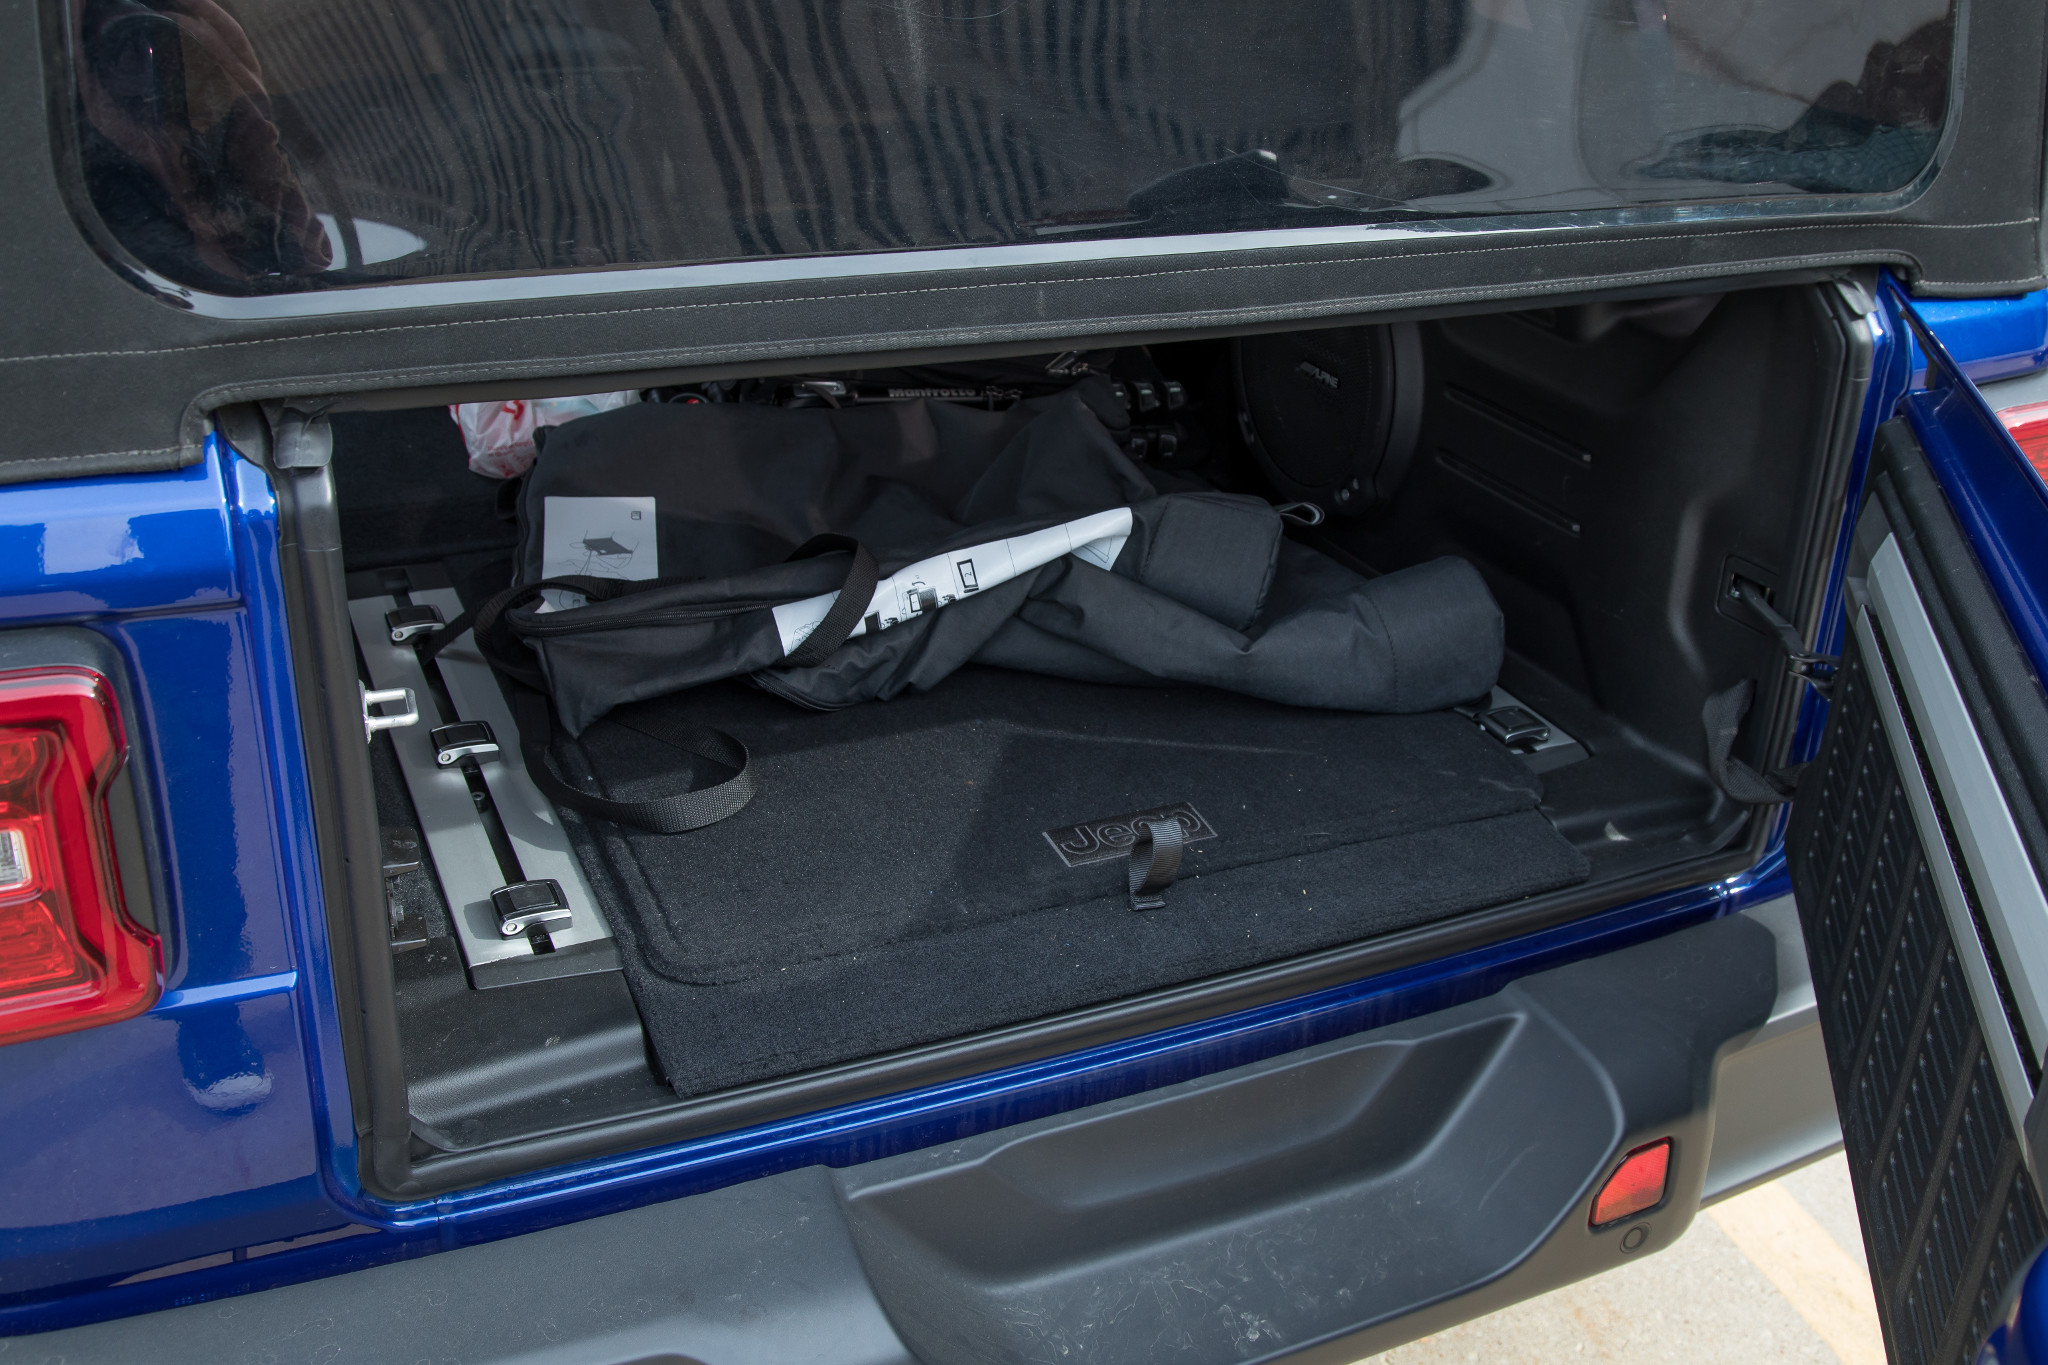 14-jeep-wrangler-2019-exterior--roof--storage--trunk.jpg